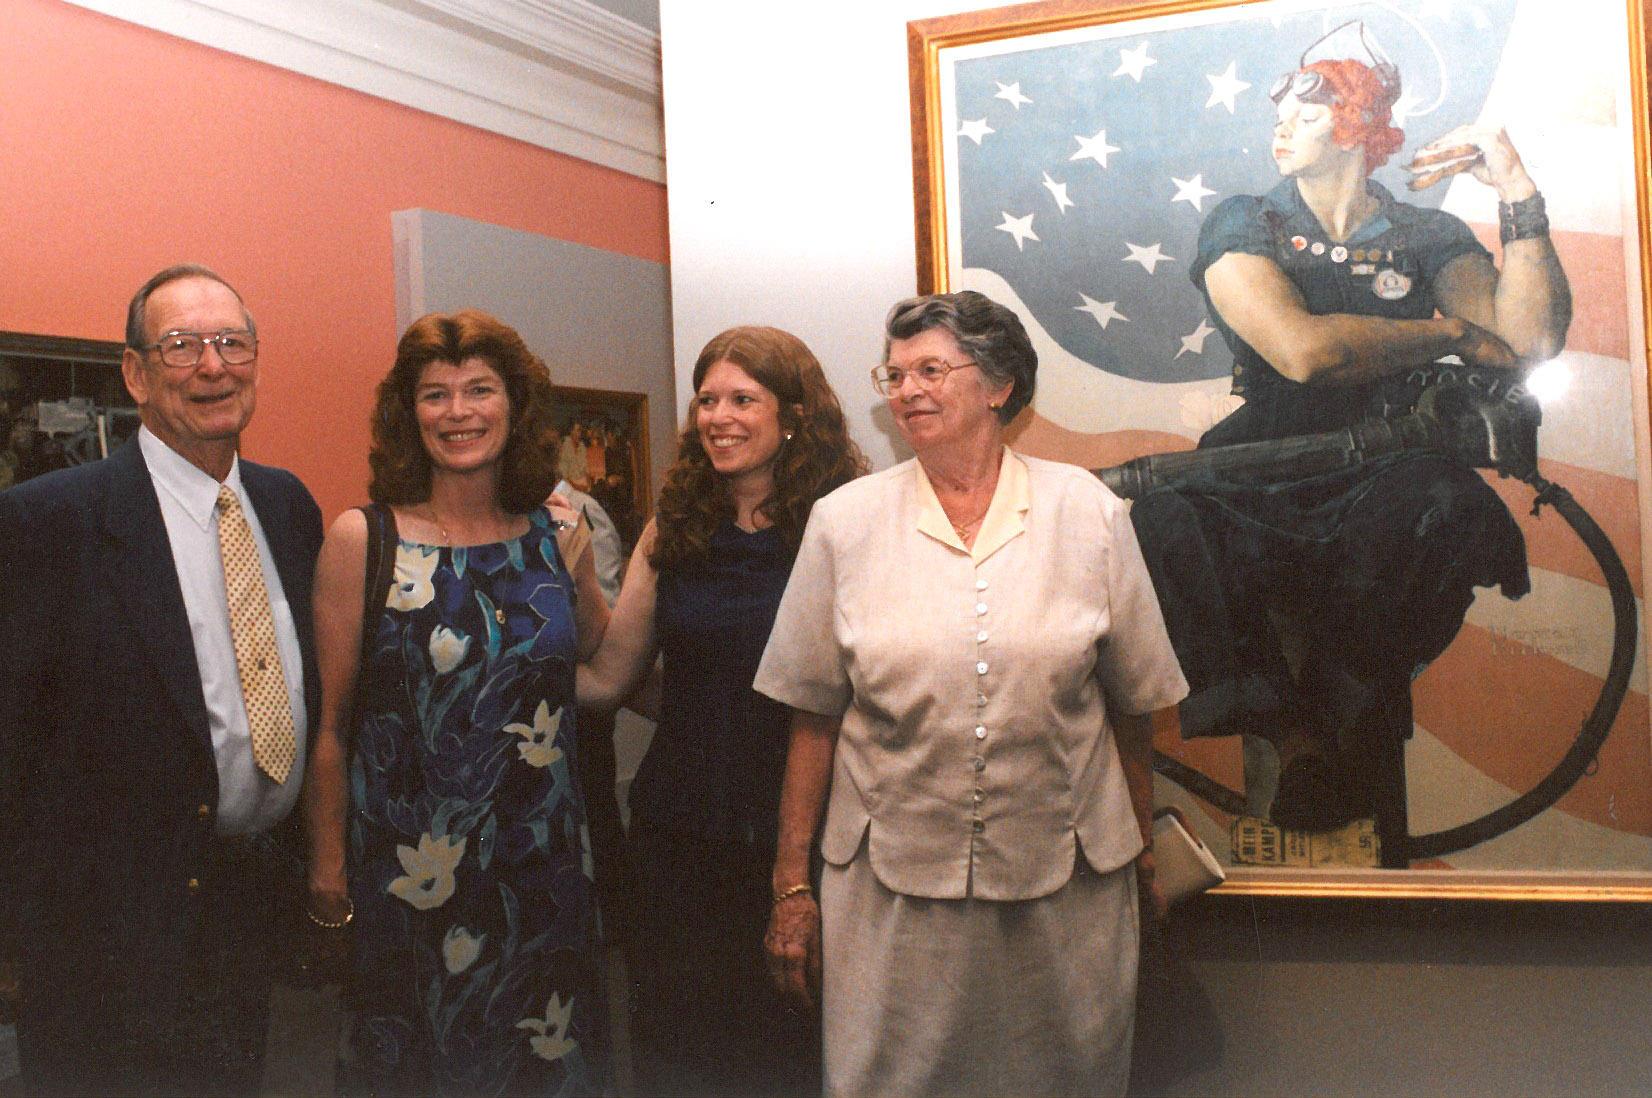 Gene Lockhart,Lisa Chess Erotic gallery Crystal R. Fox,Etel Billig